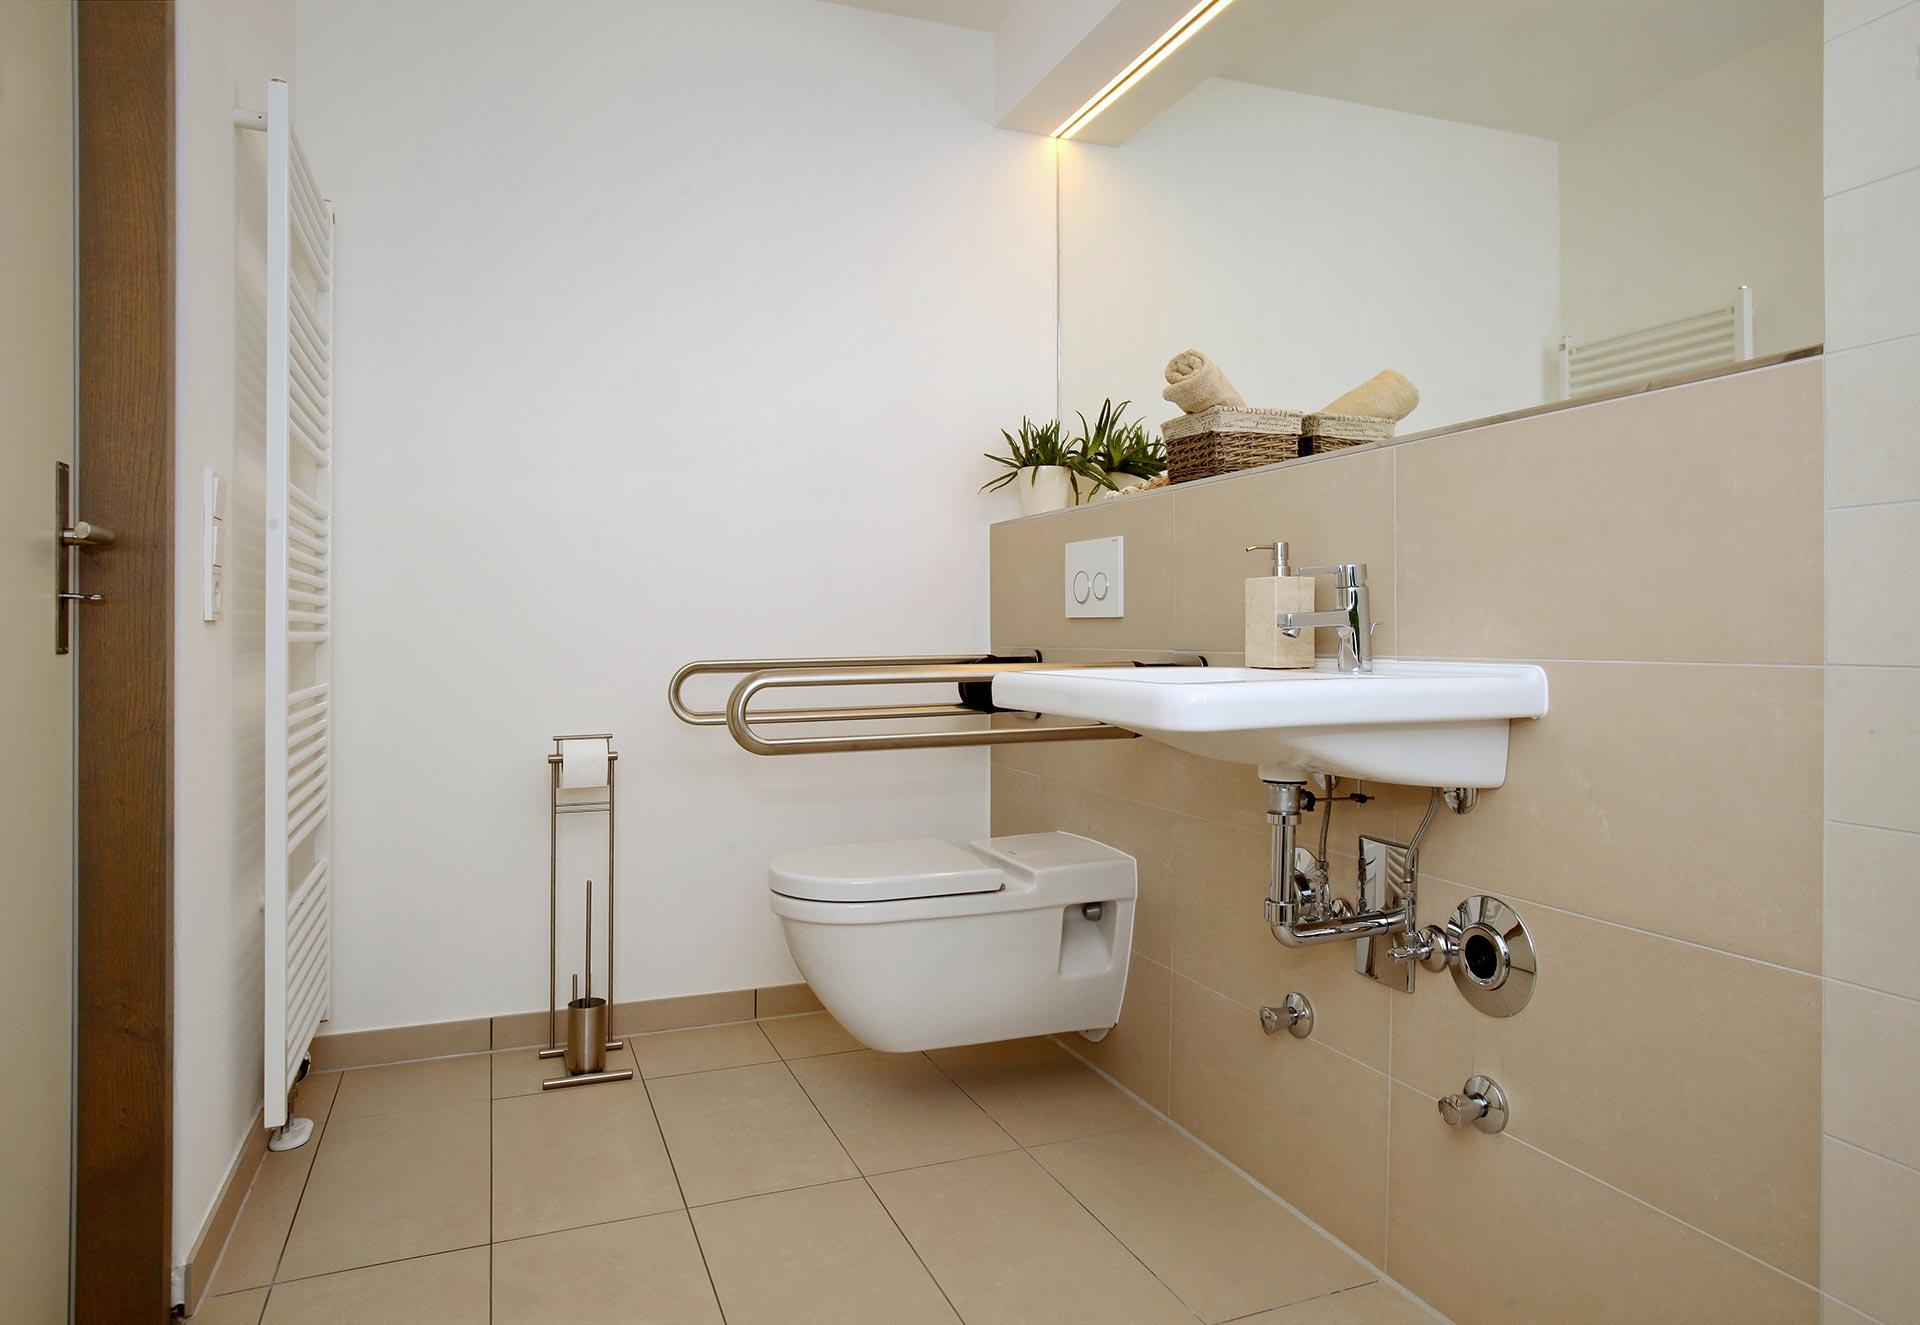 badezimmer von bonn bis koblenz. Black Bedroom Furniture Sets. Home Design Ideas